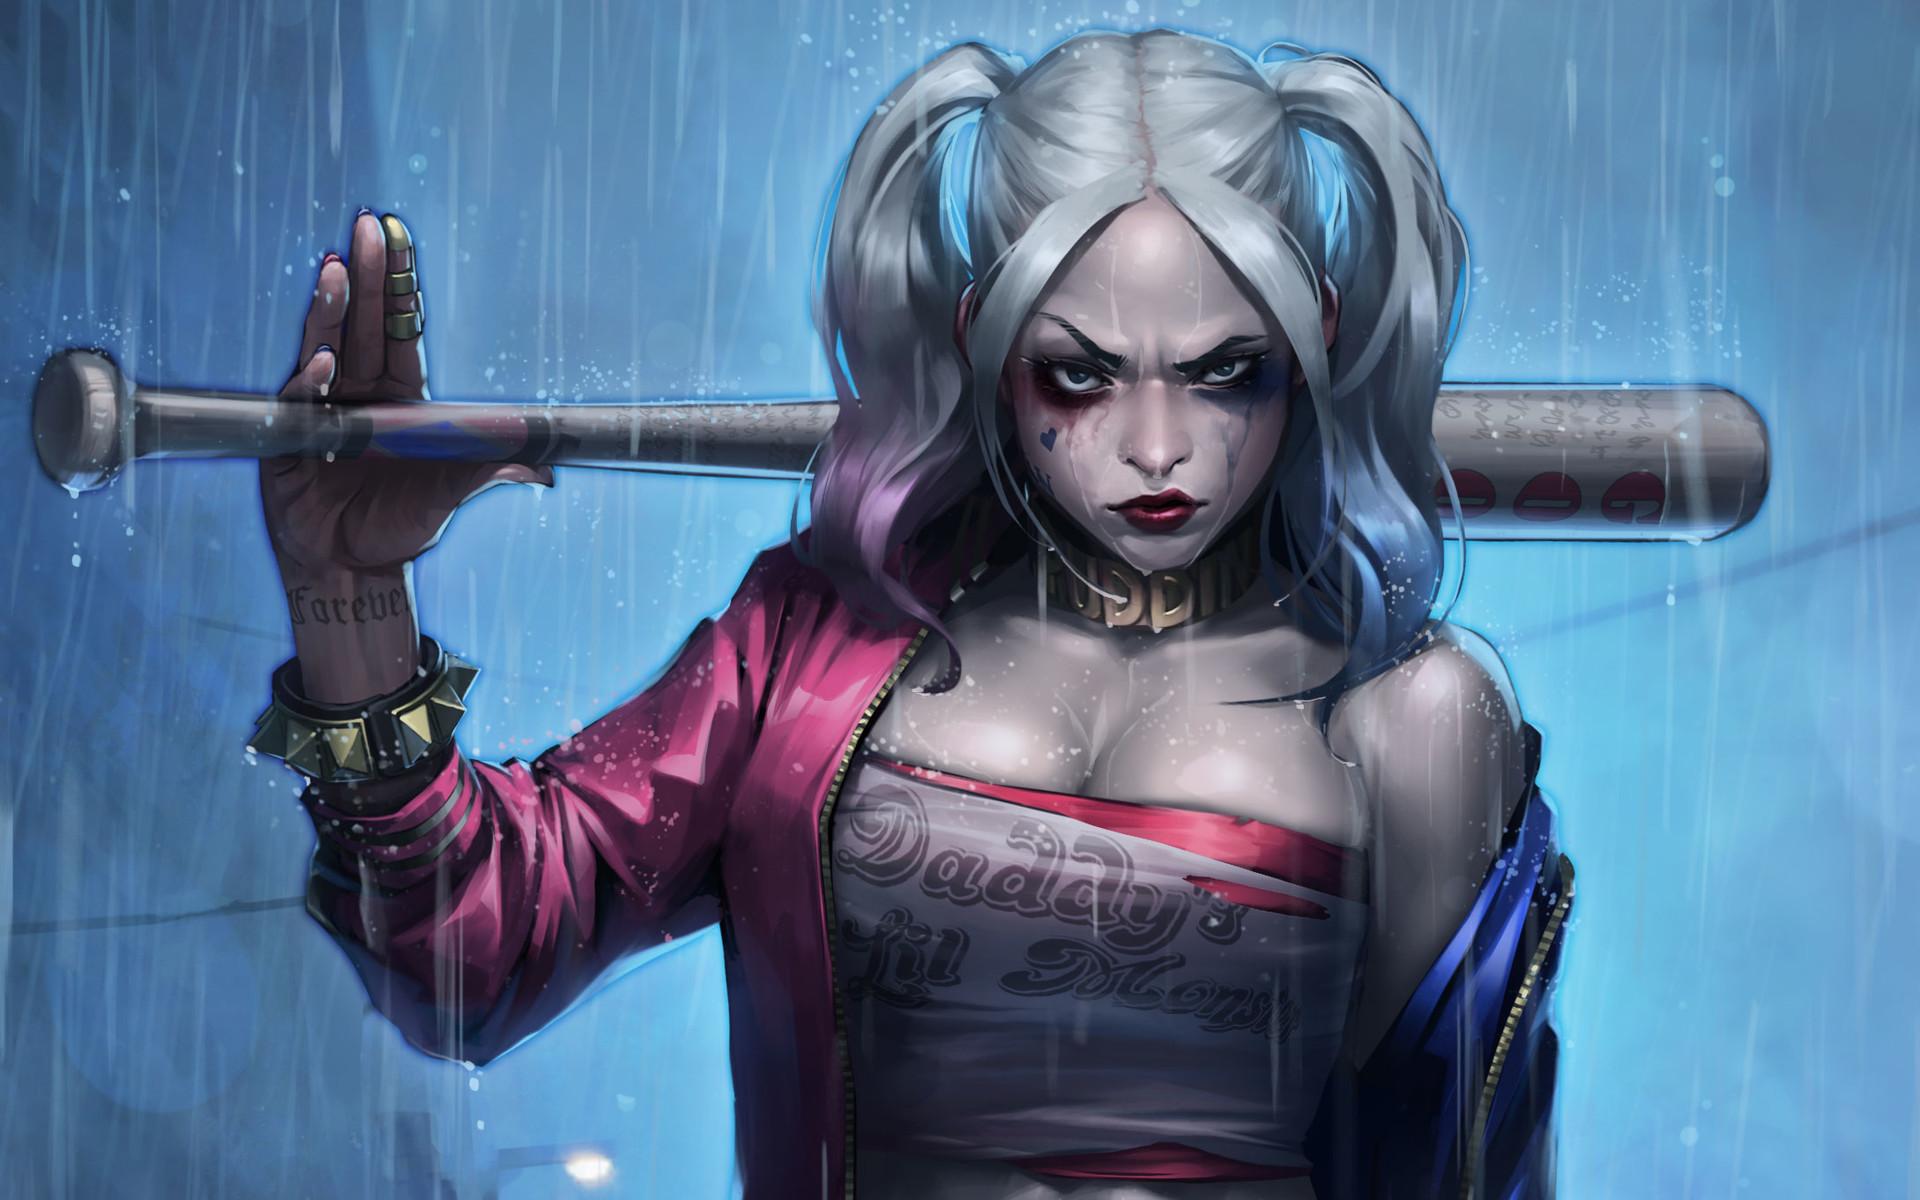 Wallpaper Anime Blue Dc Comics Harley Quinn Suicide Squad